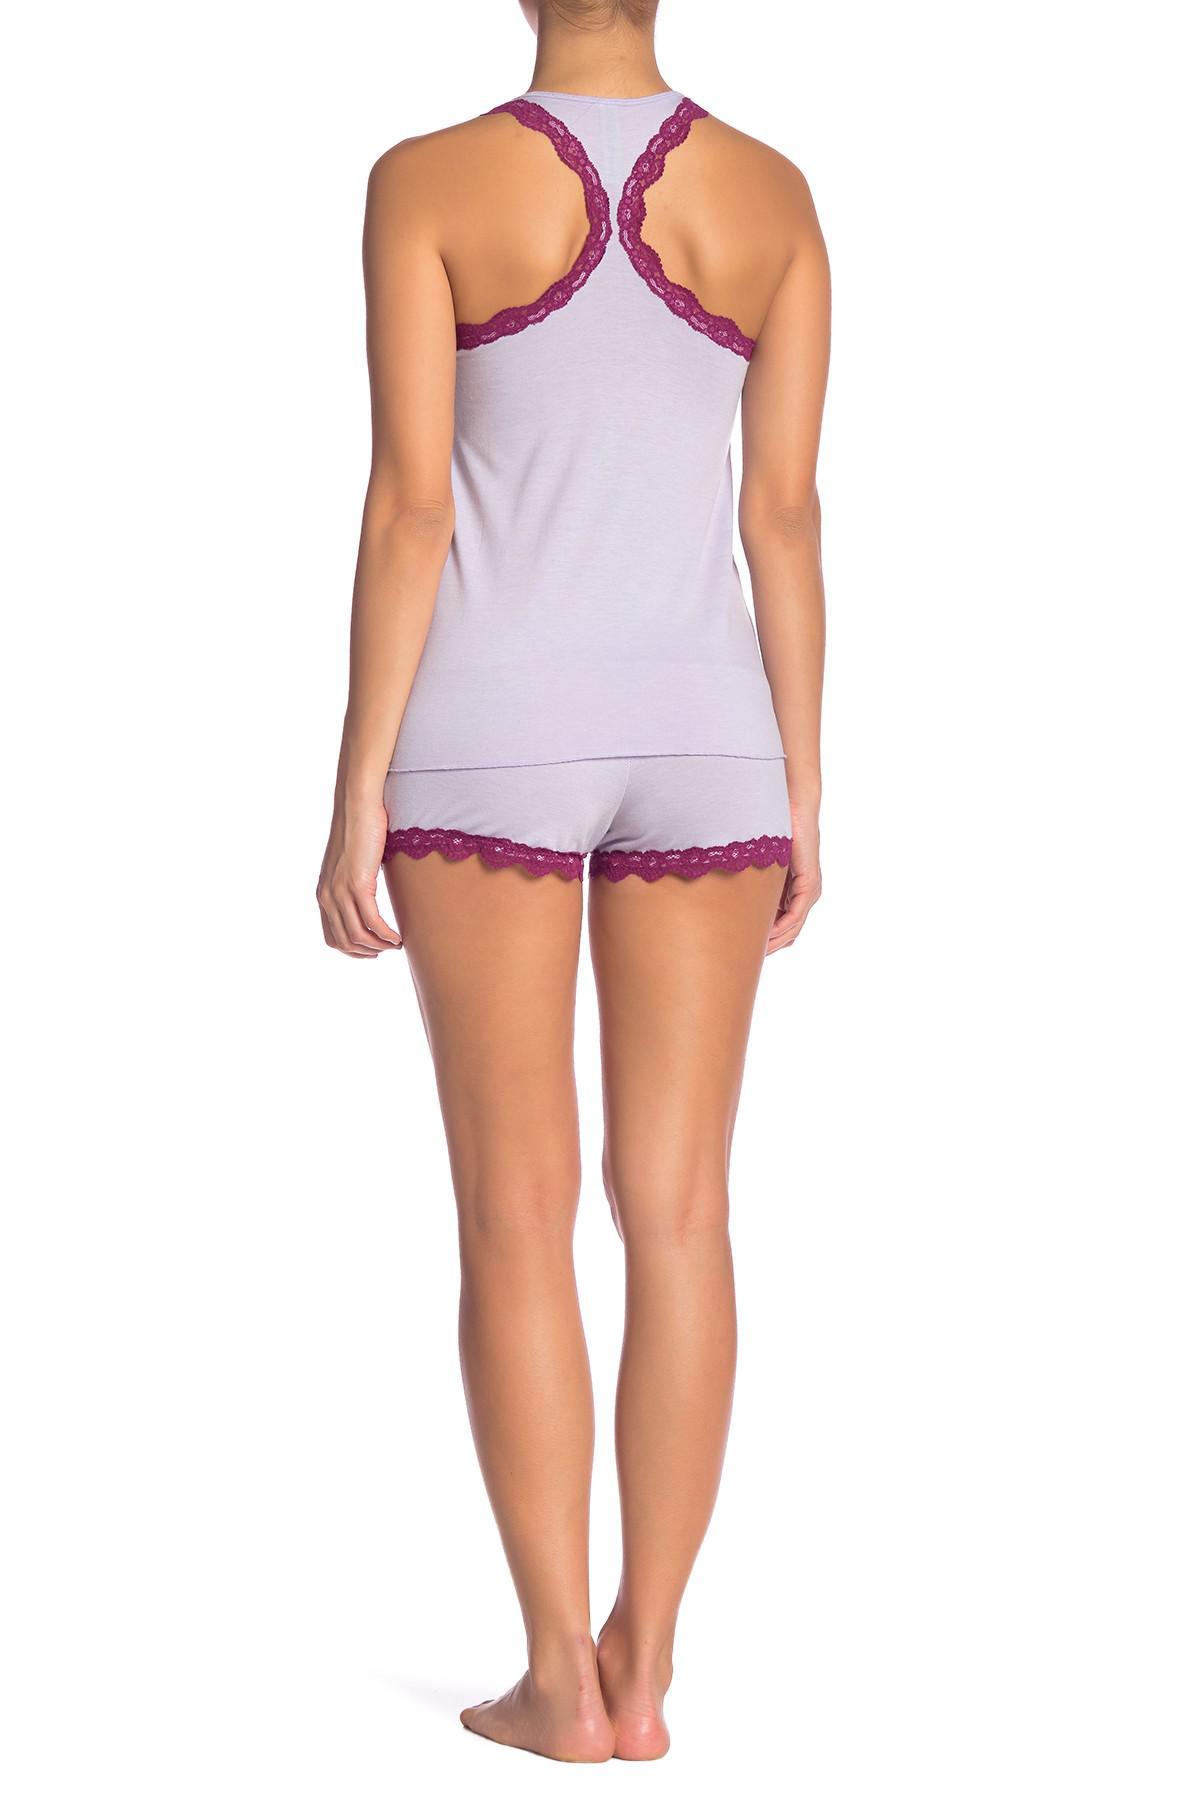 ac197efeb8 Honeydew Intimates - Purple All American Short Pajama Set - Lyst. View  fullscreen